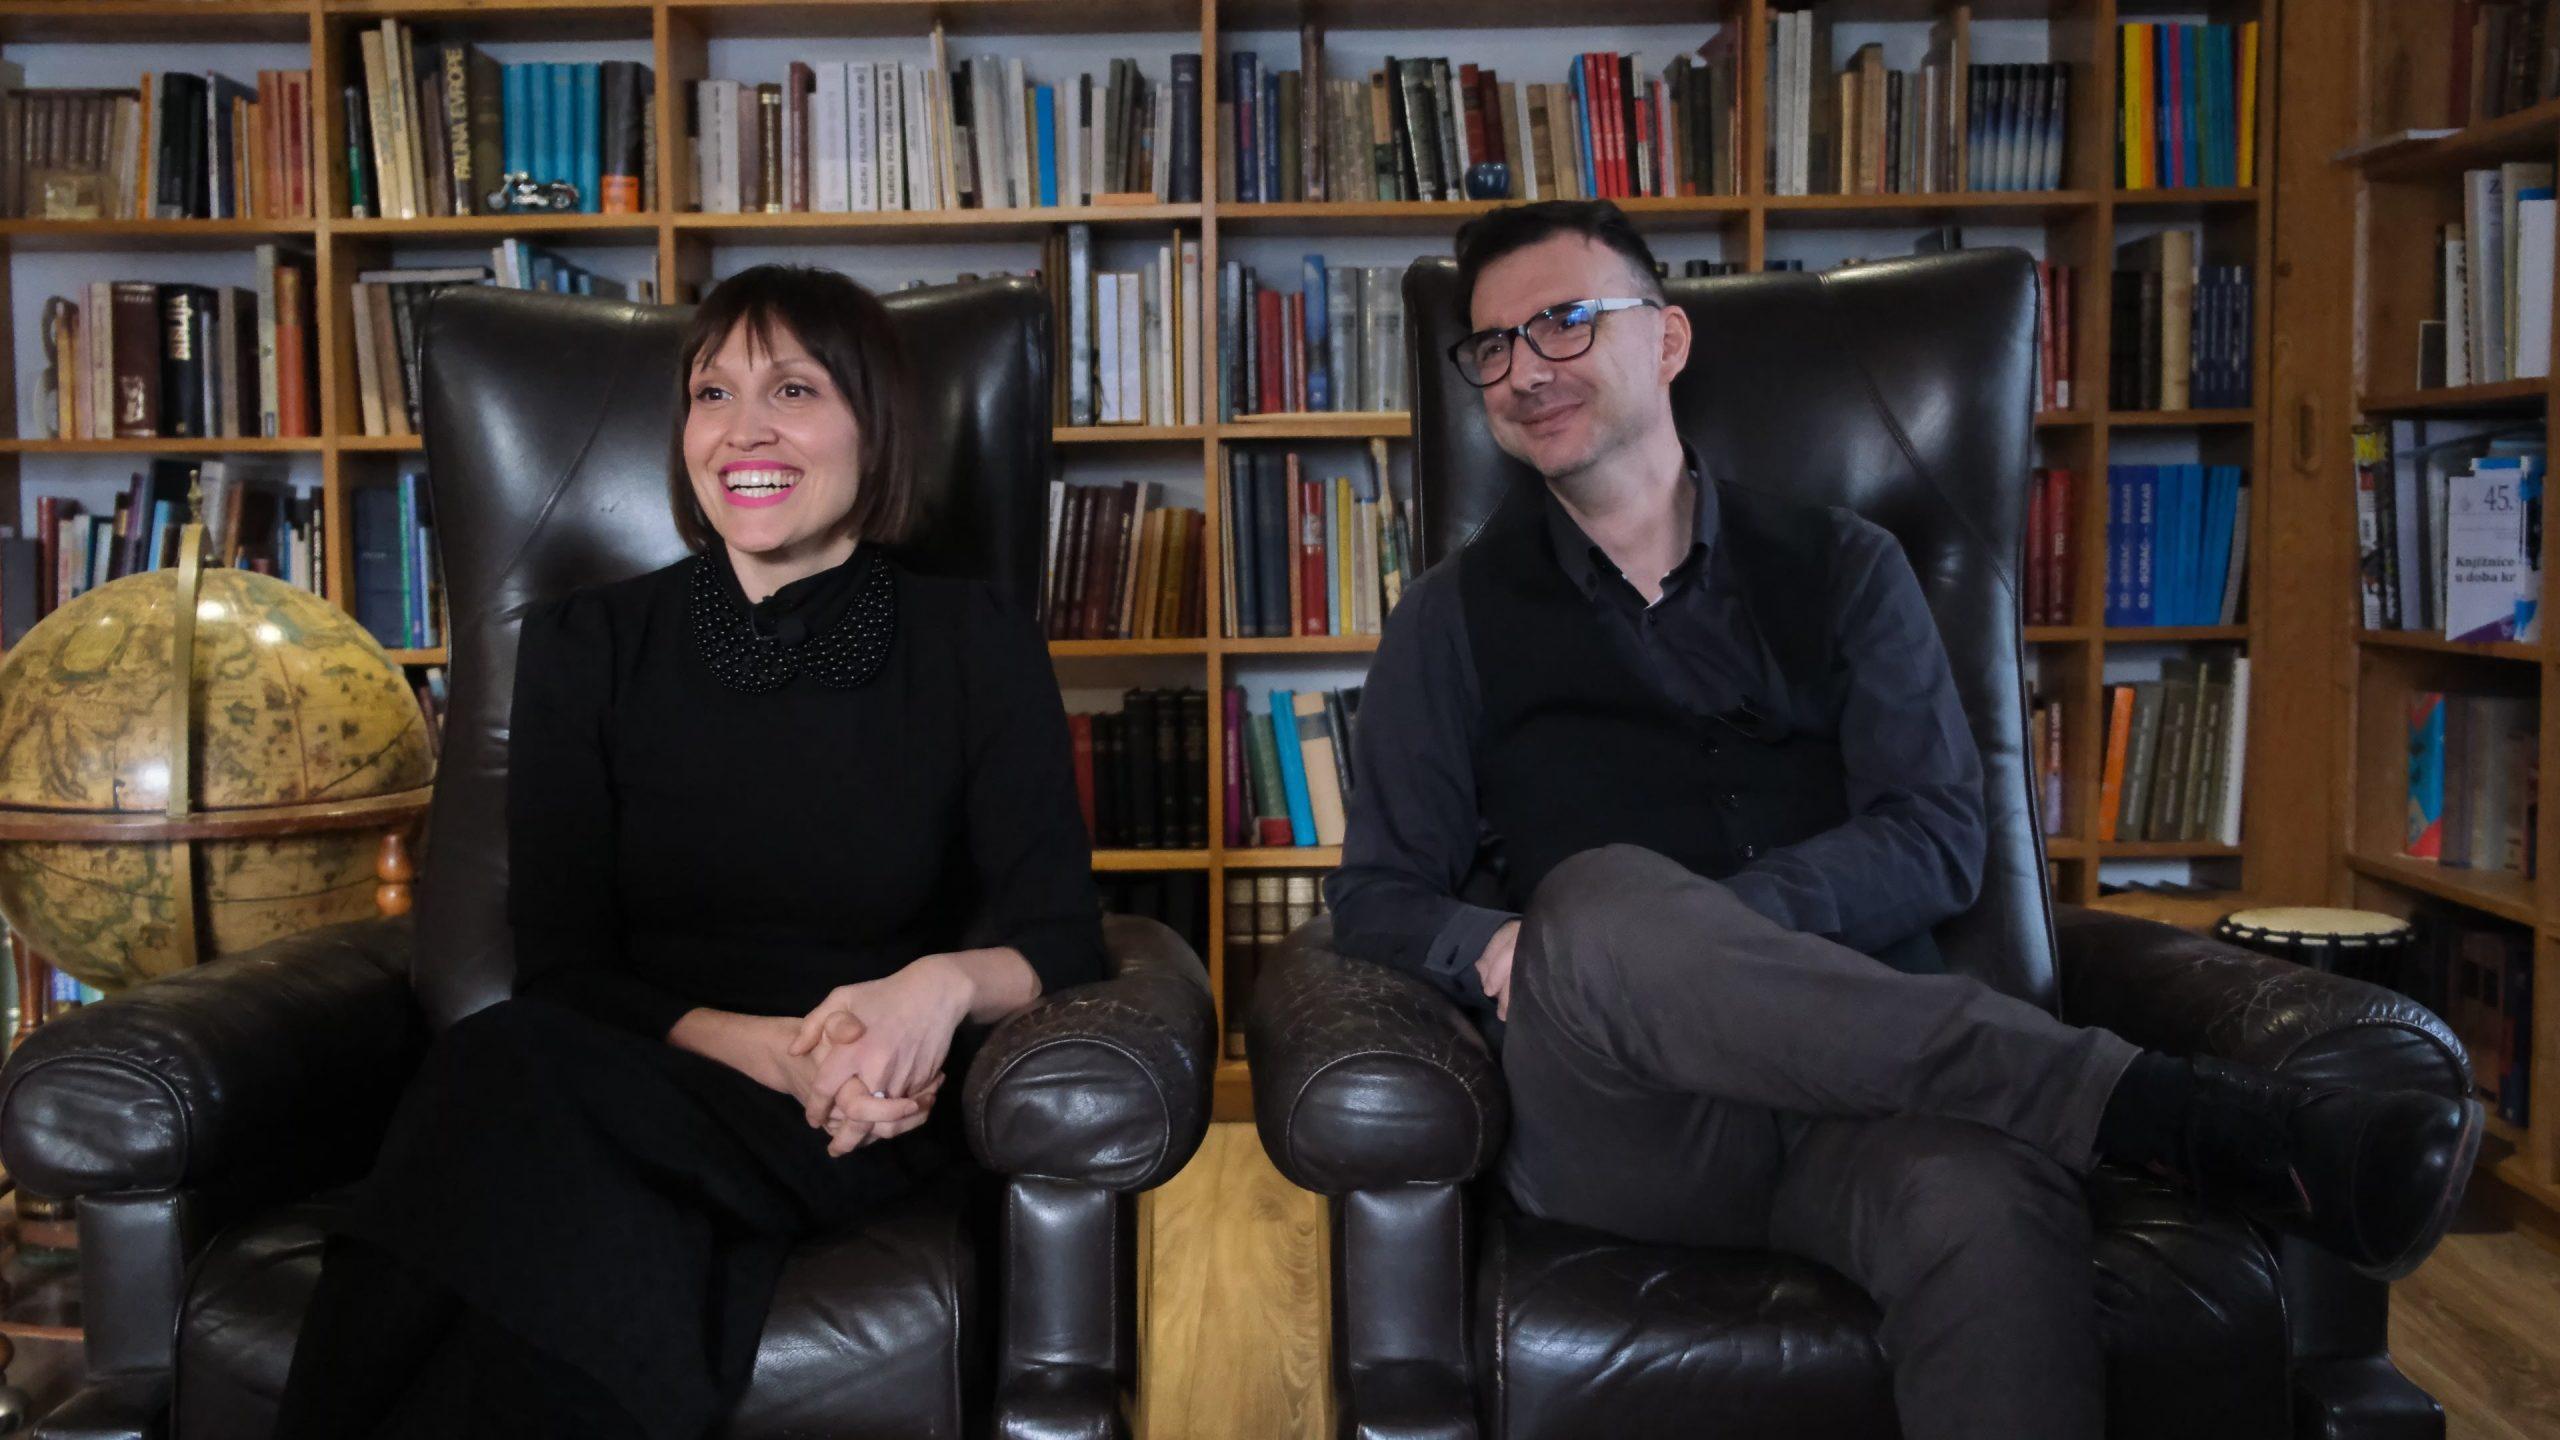 Extravagant couple: Maja i Niko Cvjetković